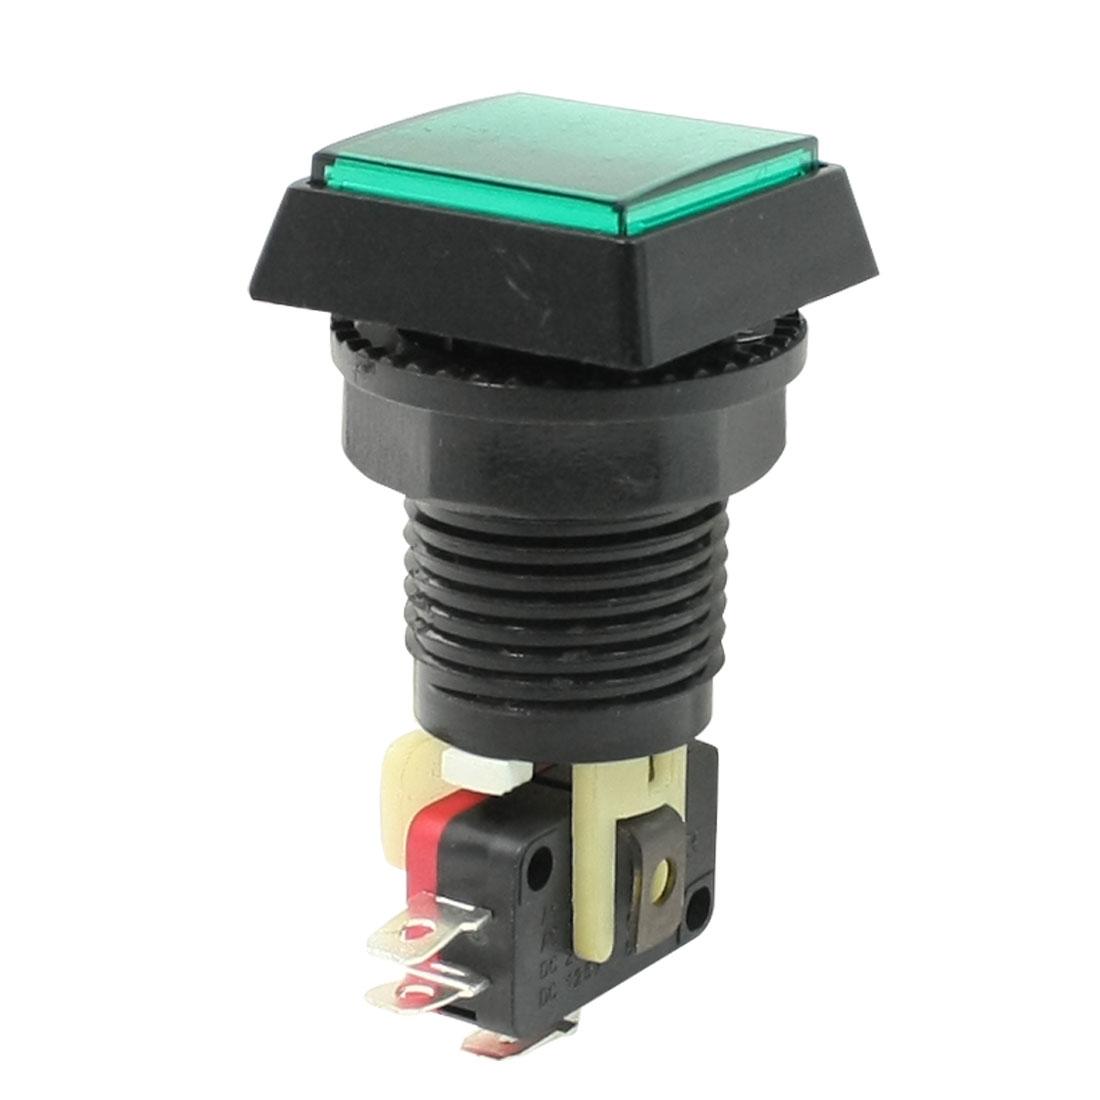 Green Square Cap NO NC Illuminated Push Button Switch AC 125V/250V 15A